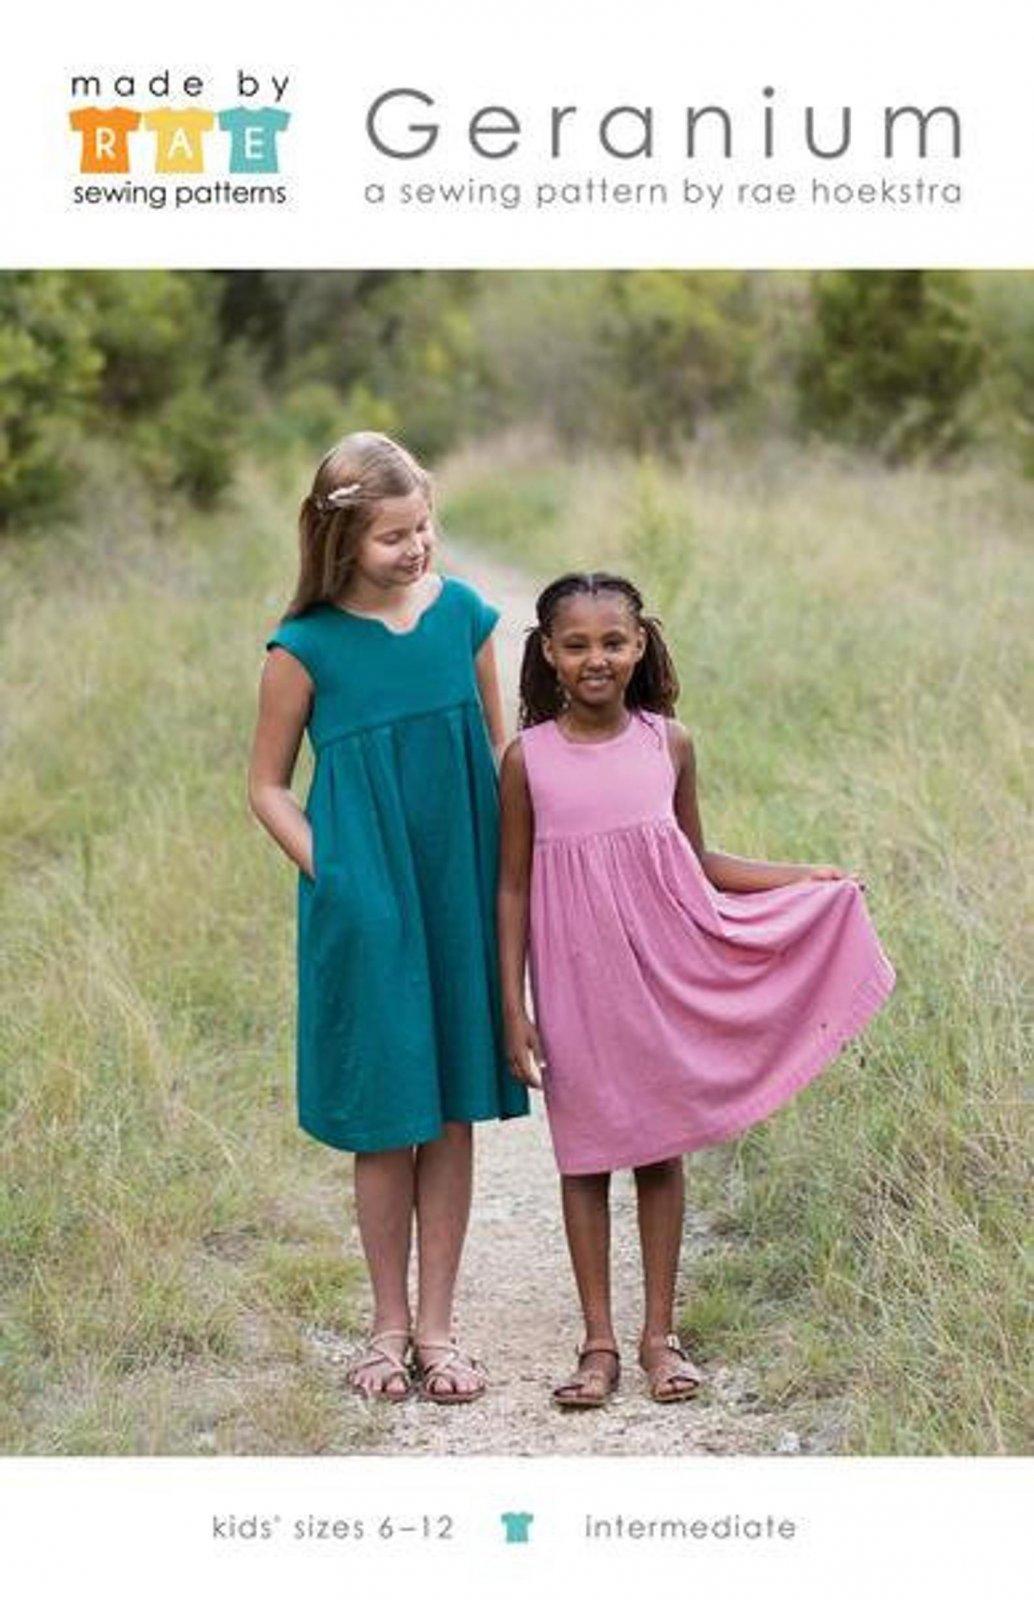 Pattern Geranium Child's Dress - Sizes 6-12 - Made by Rae